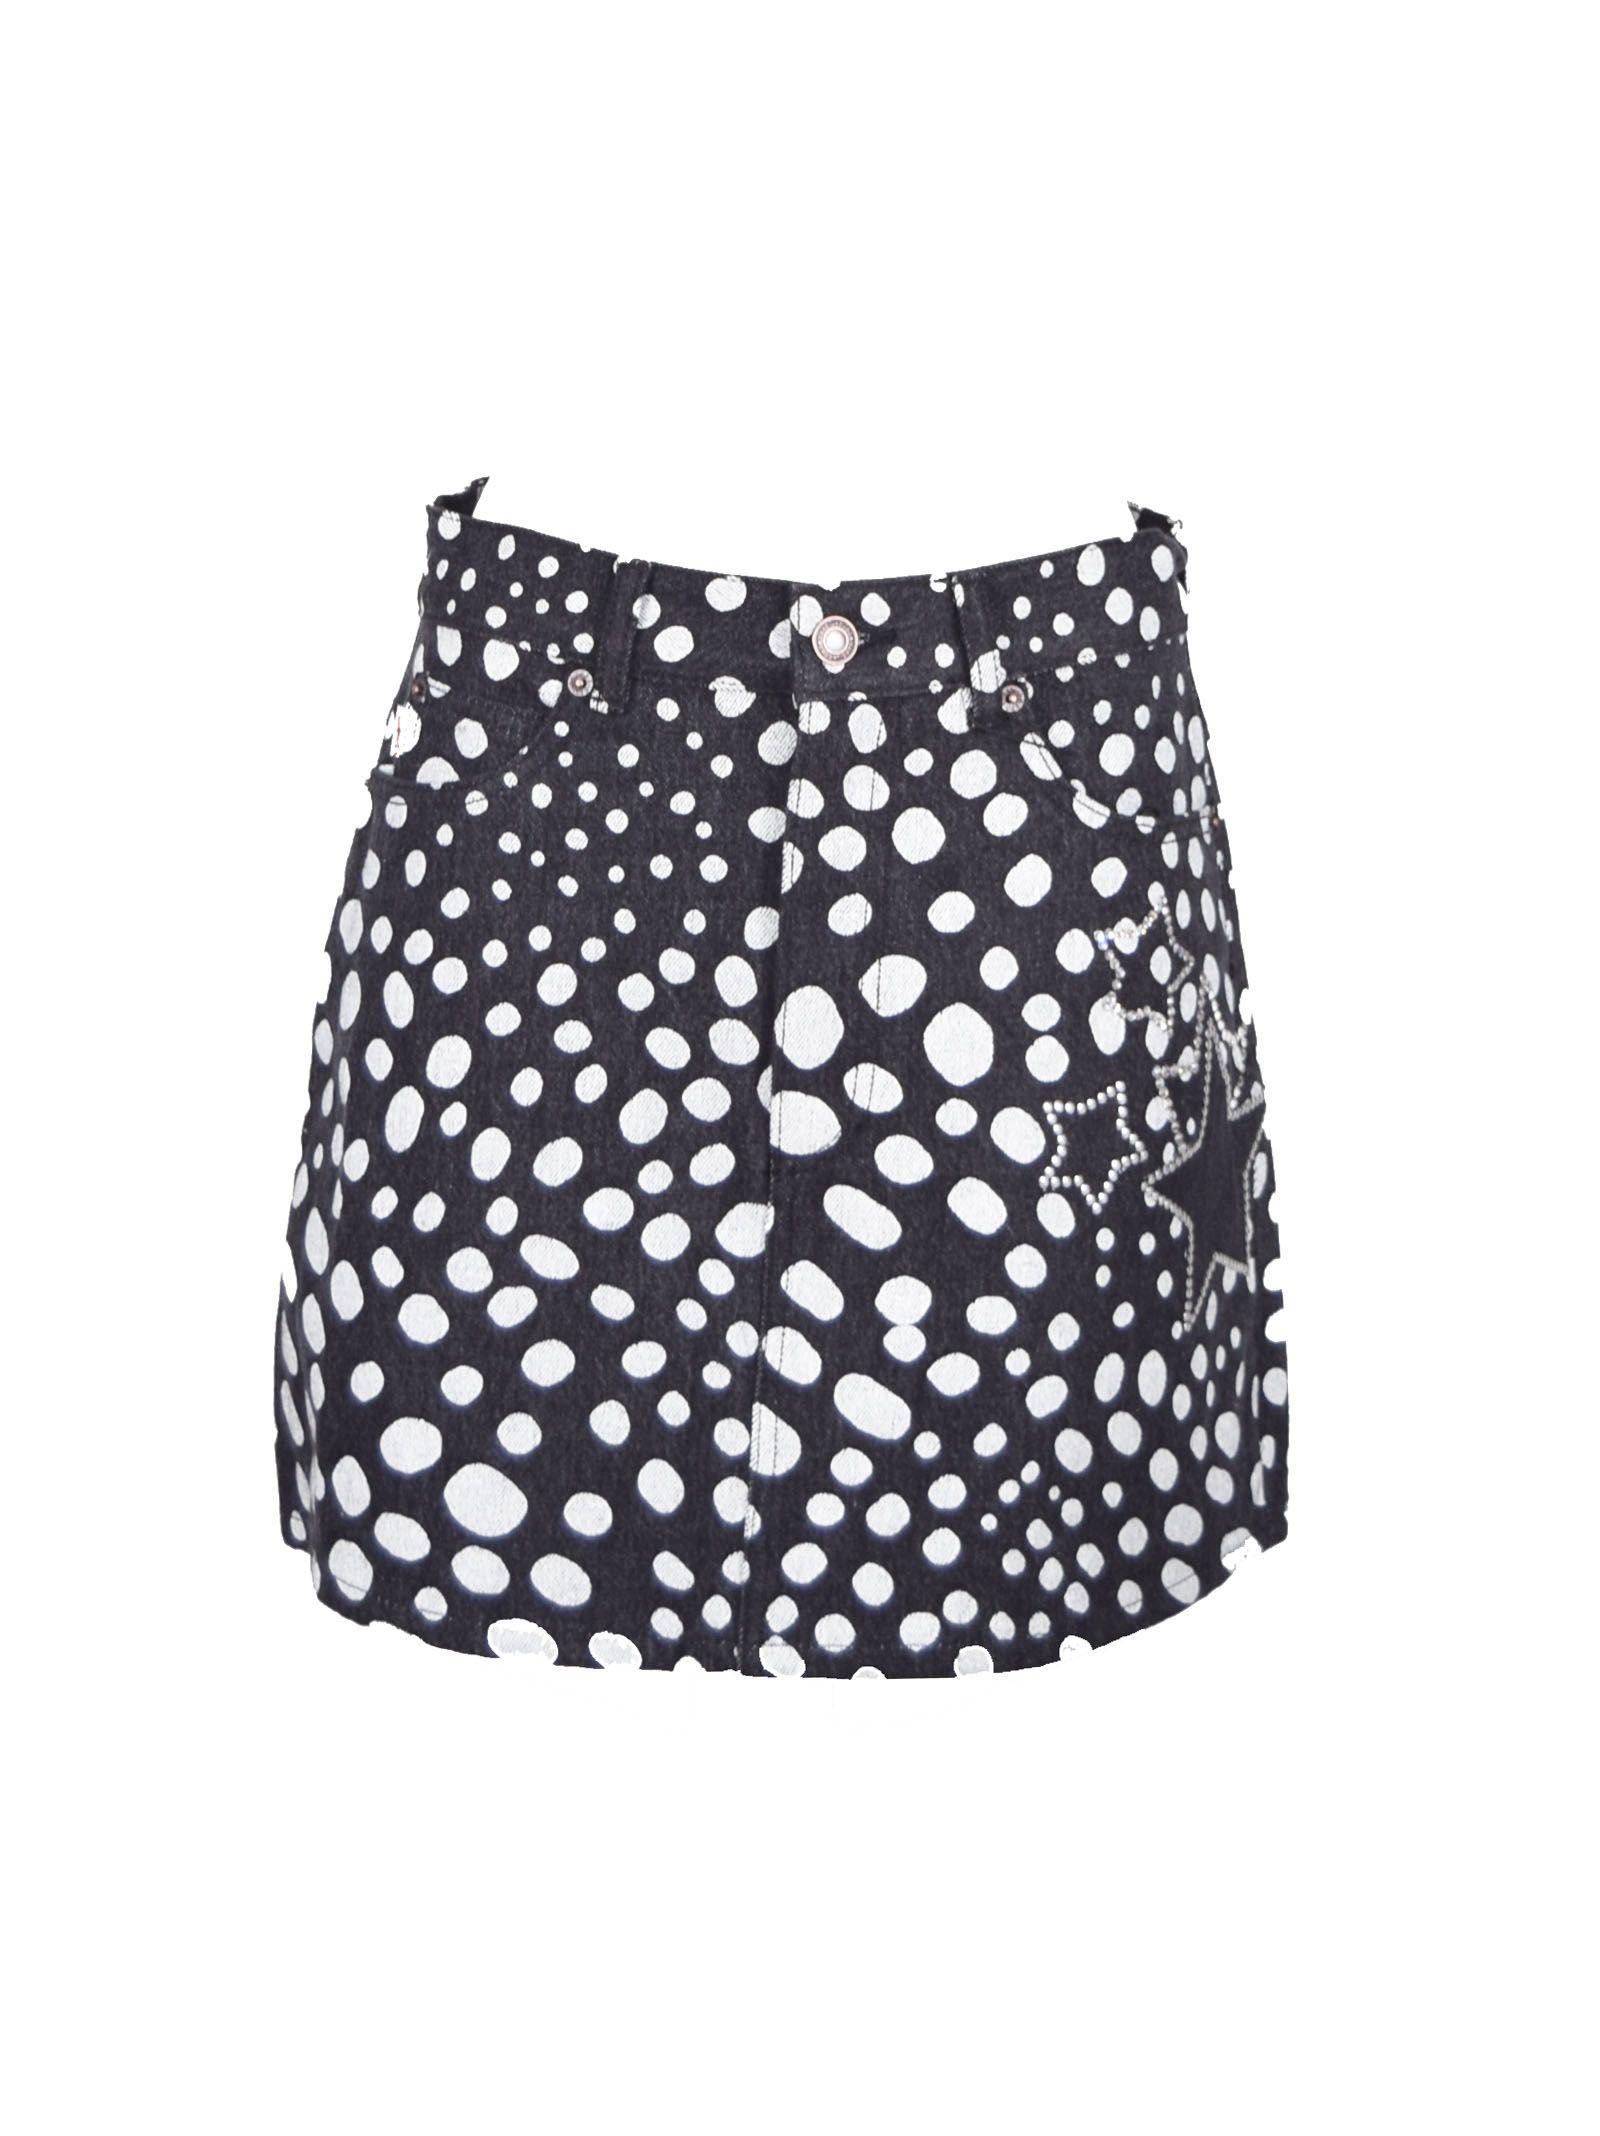 Marc Jacobs Embellished Spot Denim Mini Skirt